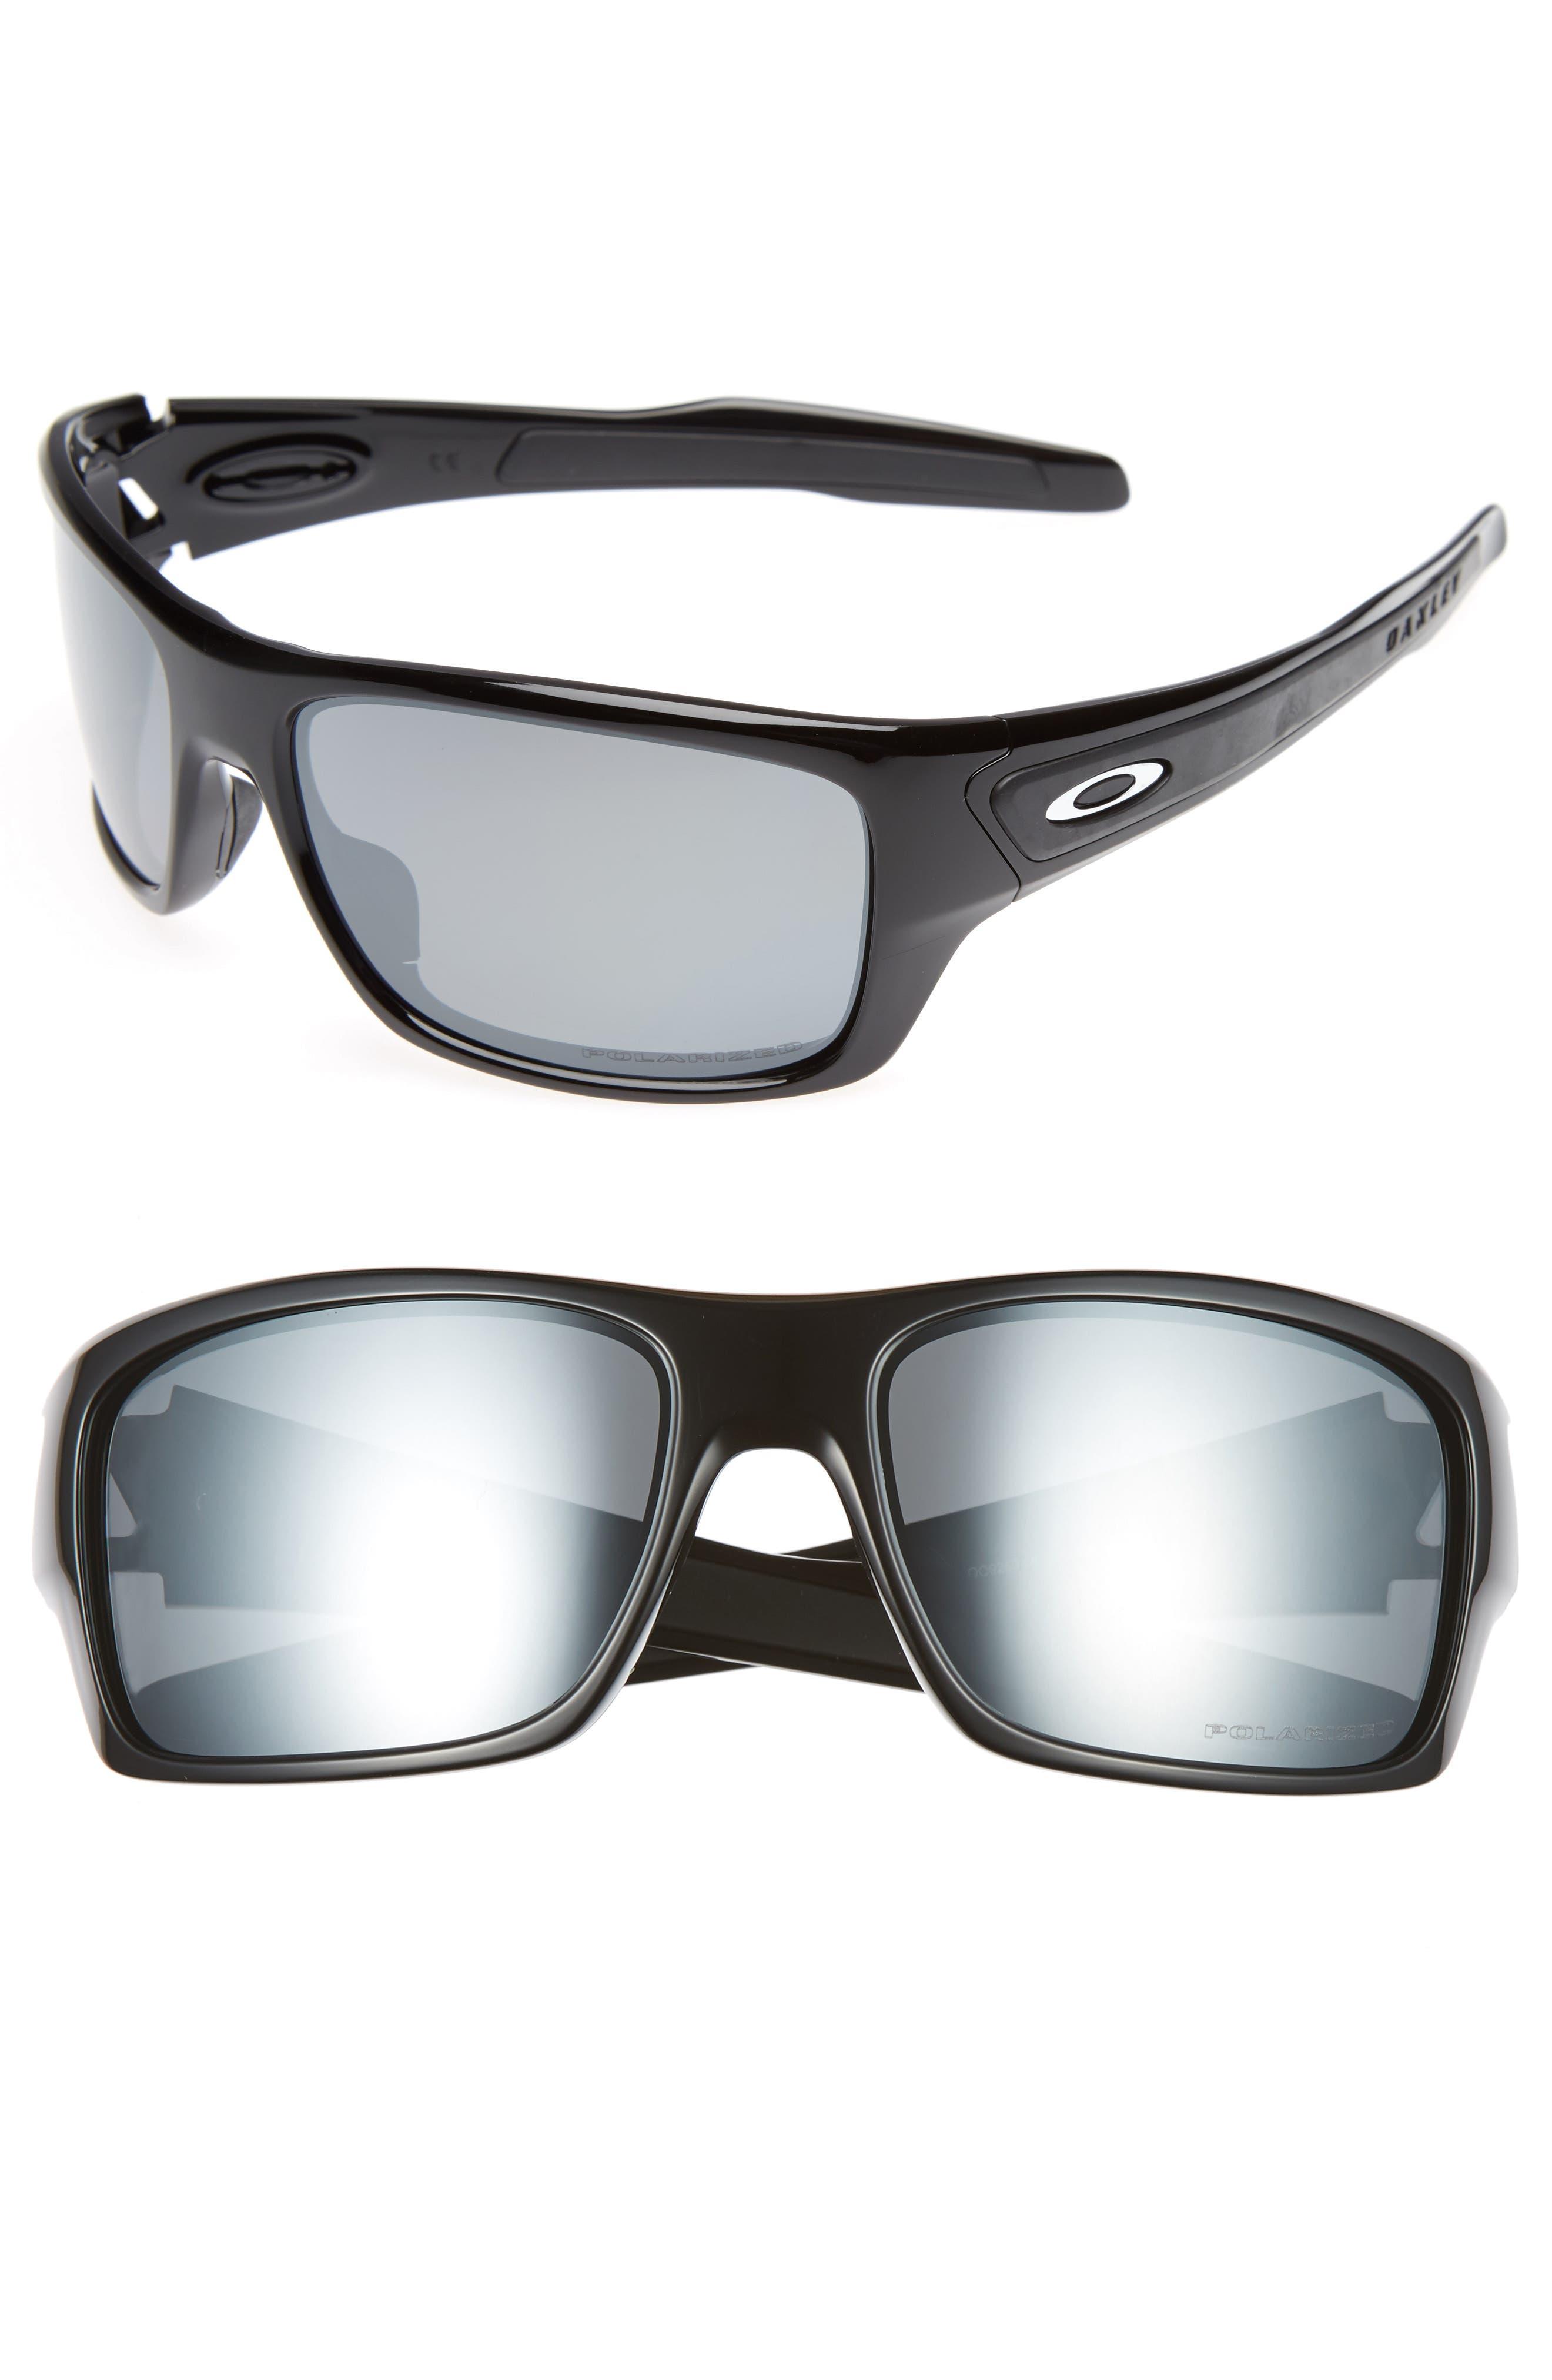 Oakley Turbine 65Mm Polarized Sunglasses -